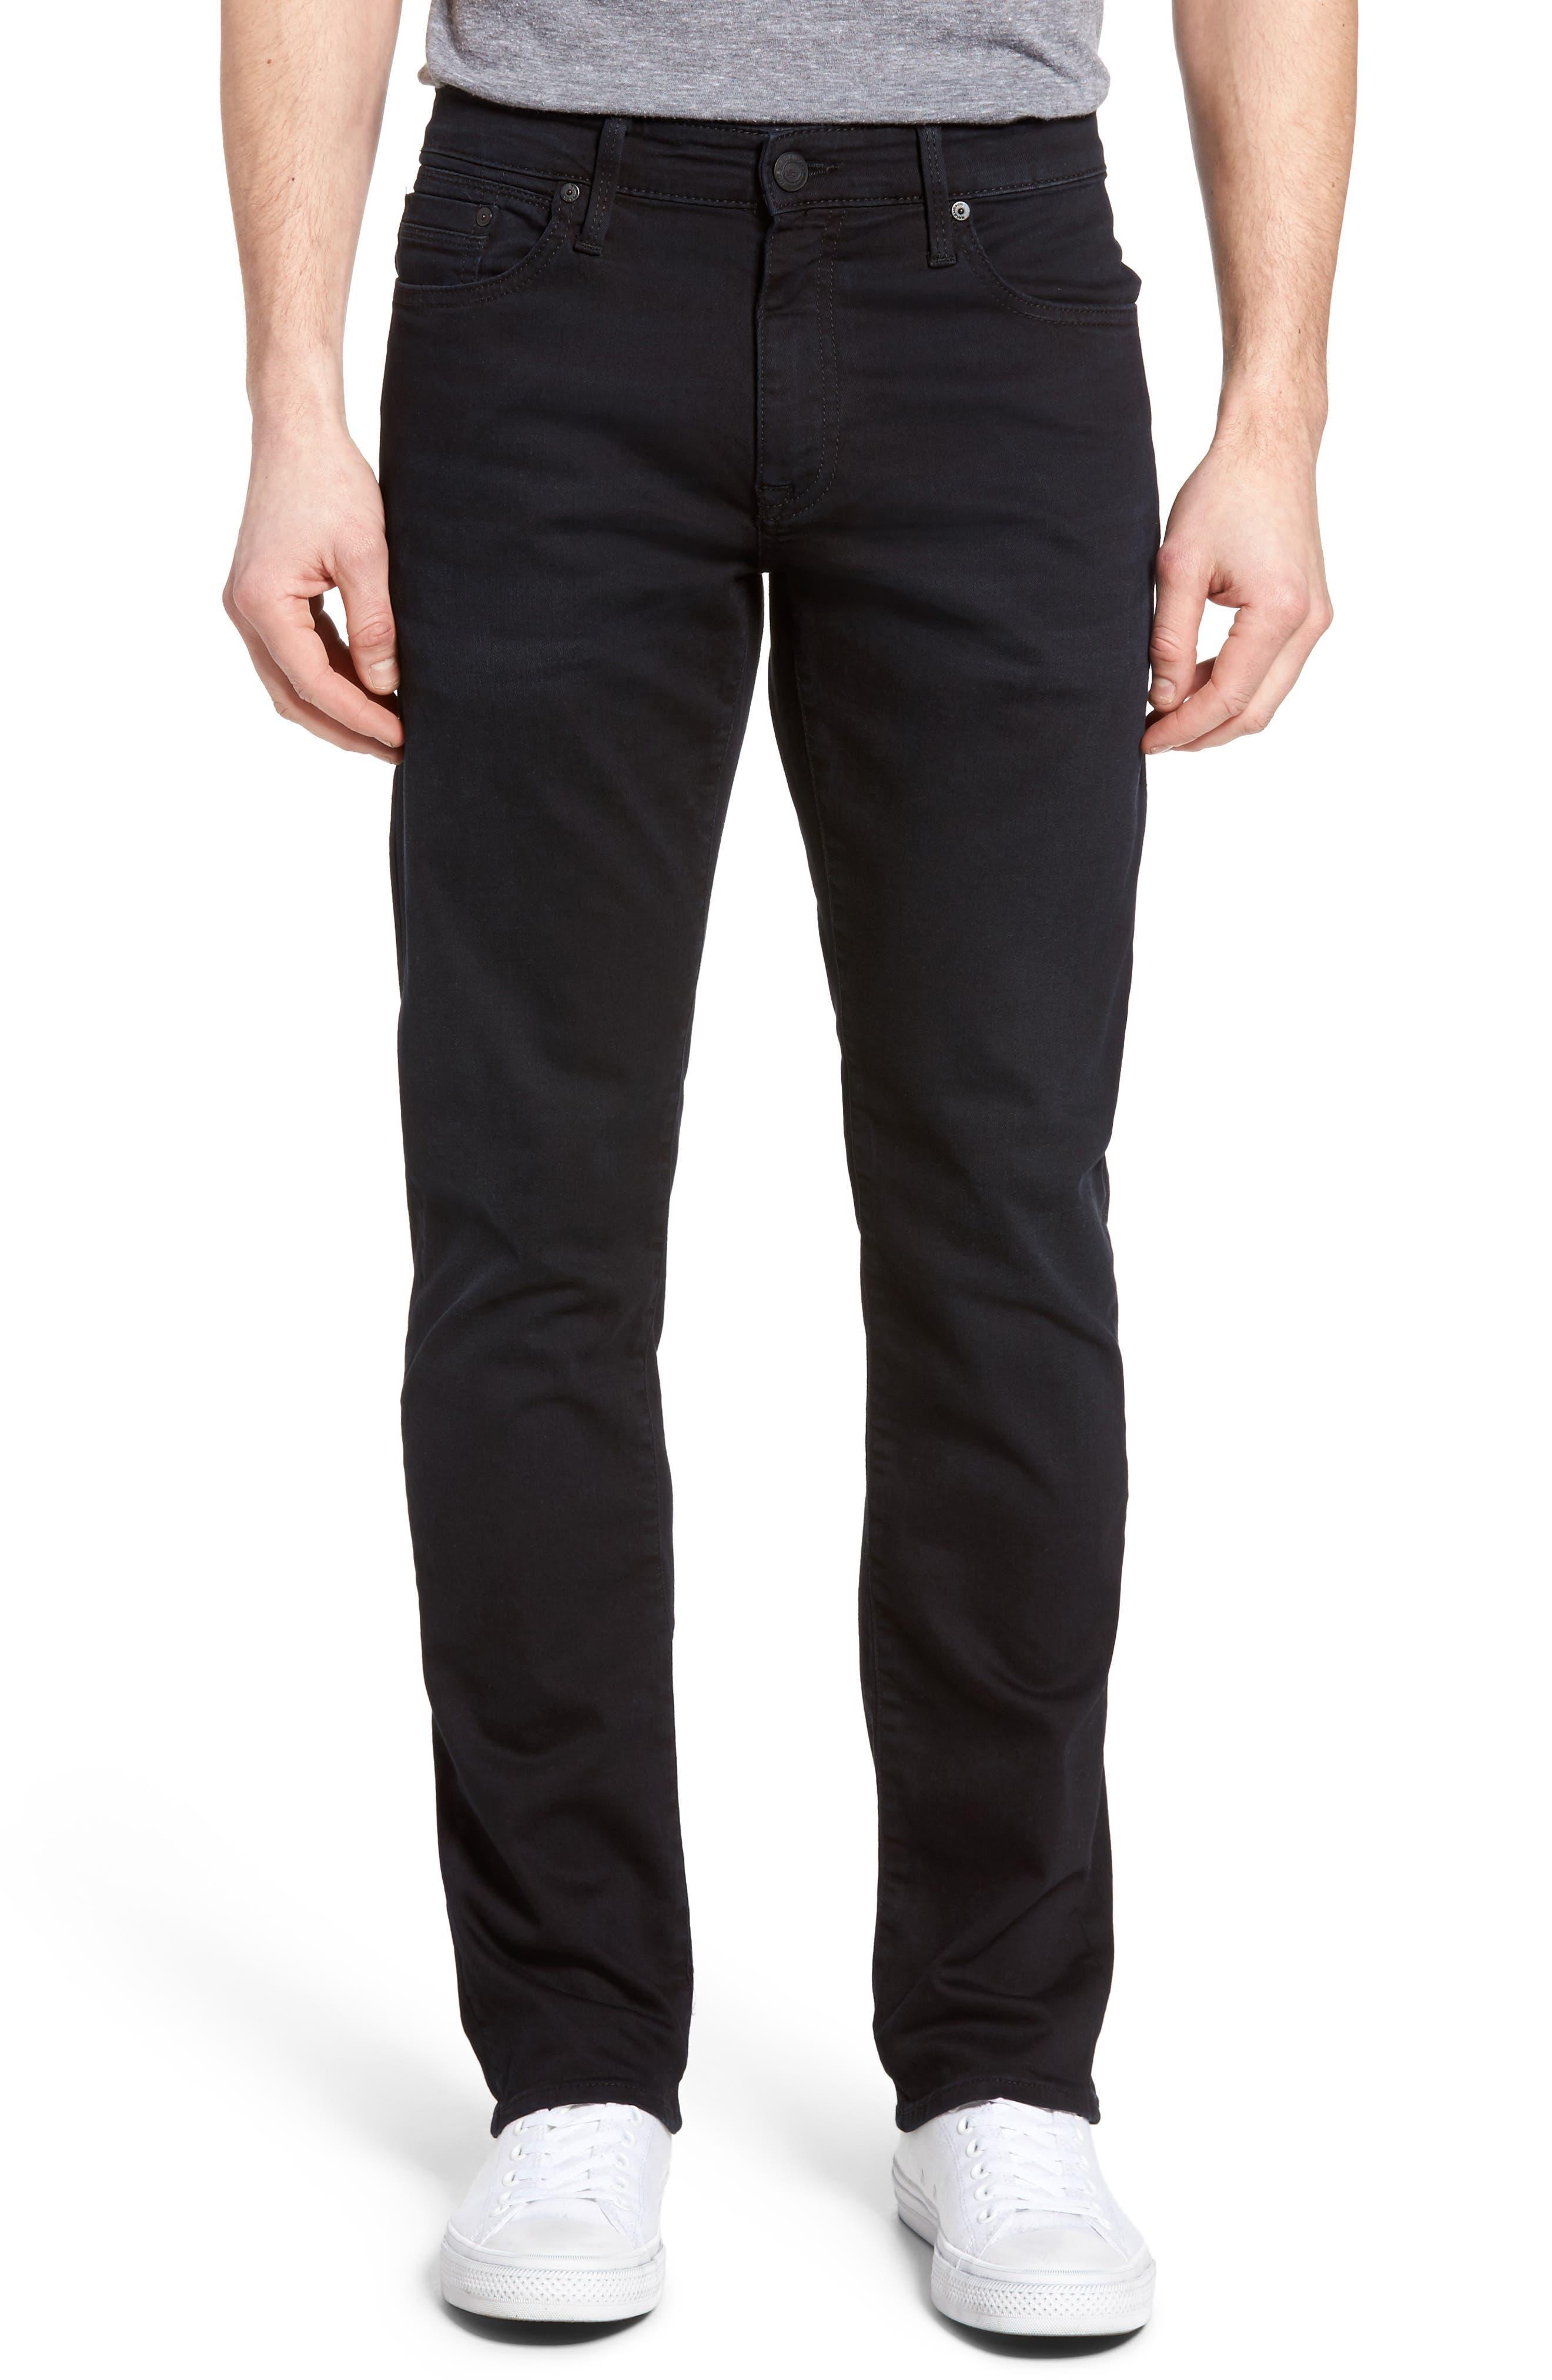 Zach Straight Leg Jeans,                         Main,                         color, 401